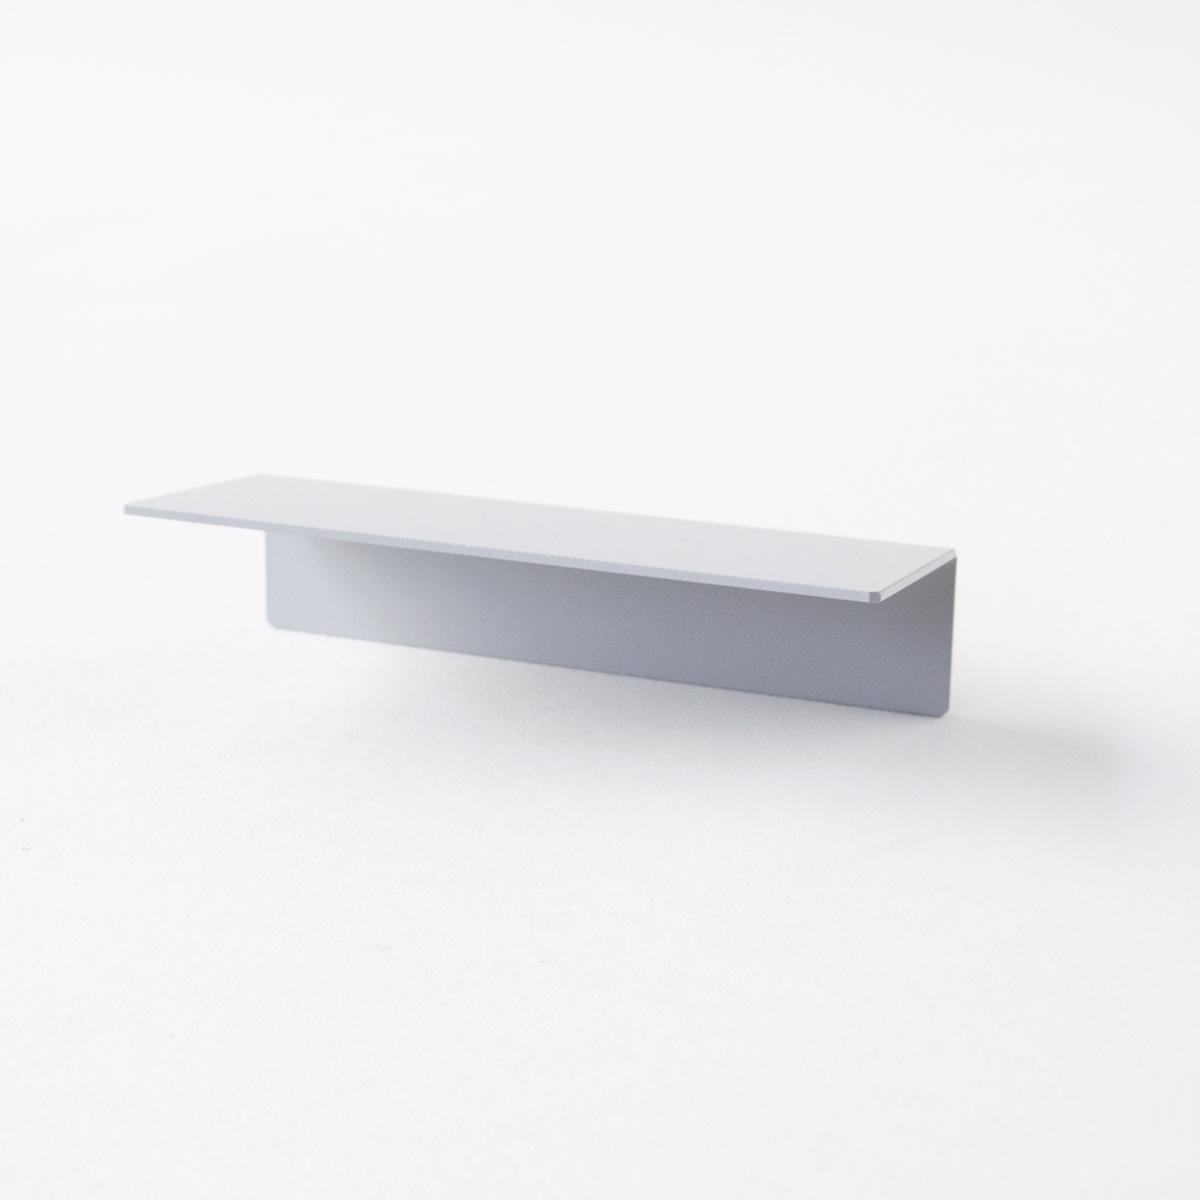 【 5° SHELF 】5度の傾きが特徴!シンプルなマグネットシェルフ